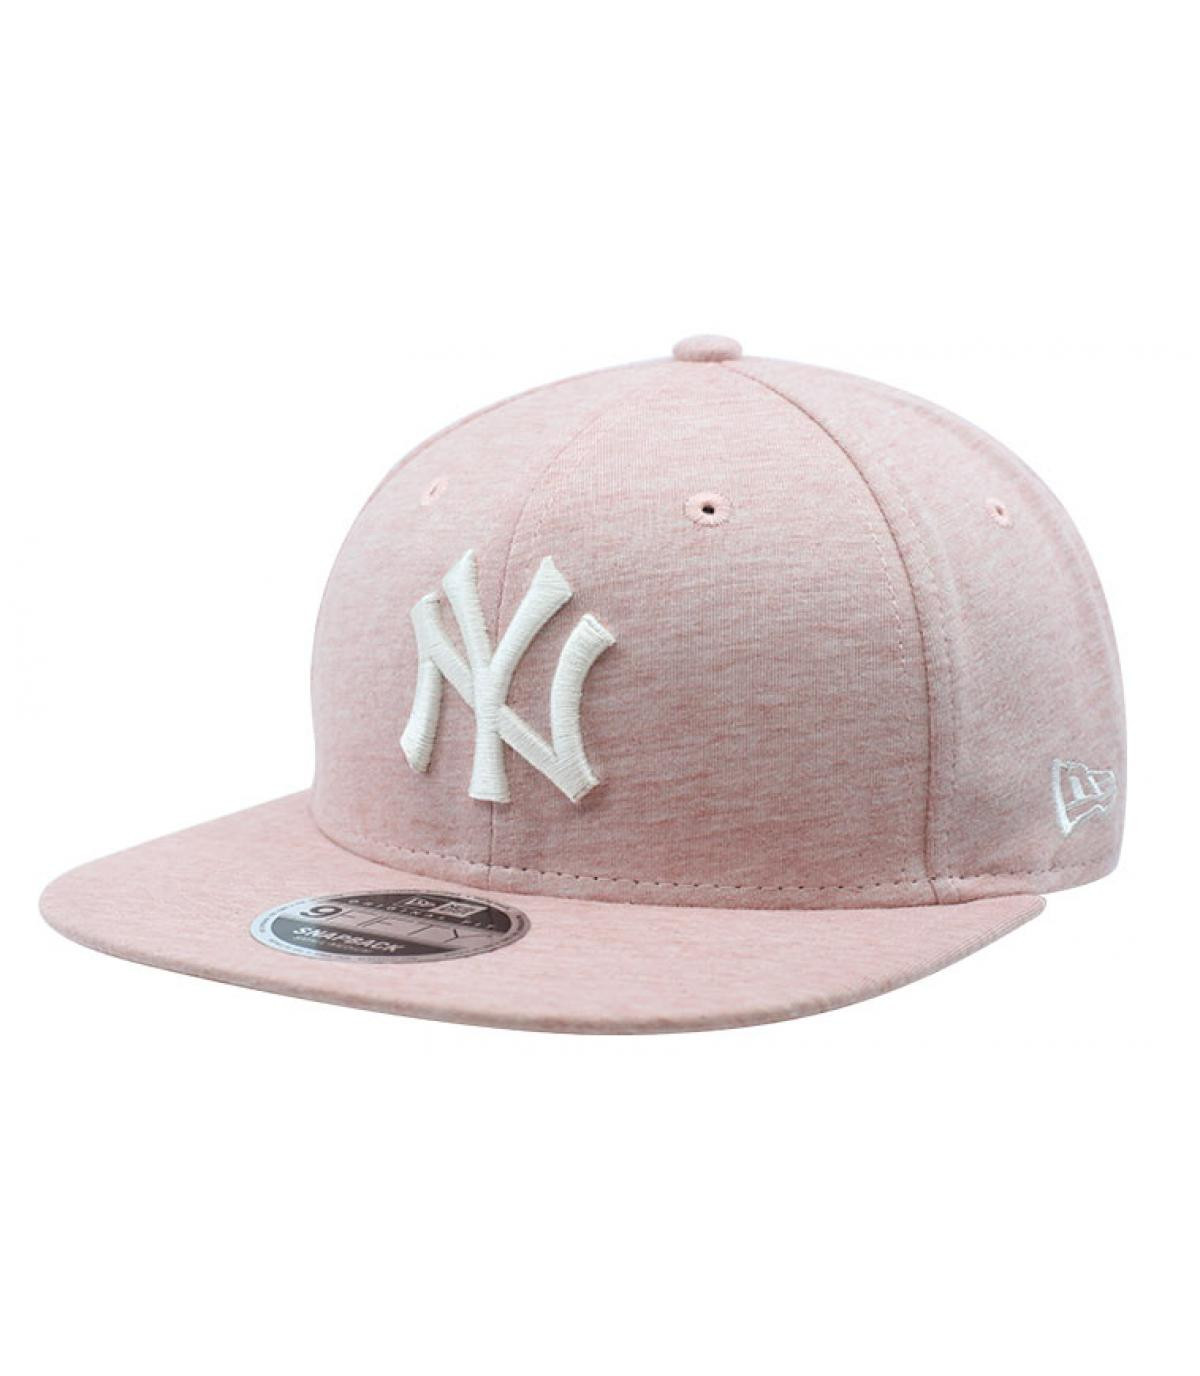 Détails Snapback Jersey Brights 9Fifty NY pink - image 2